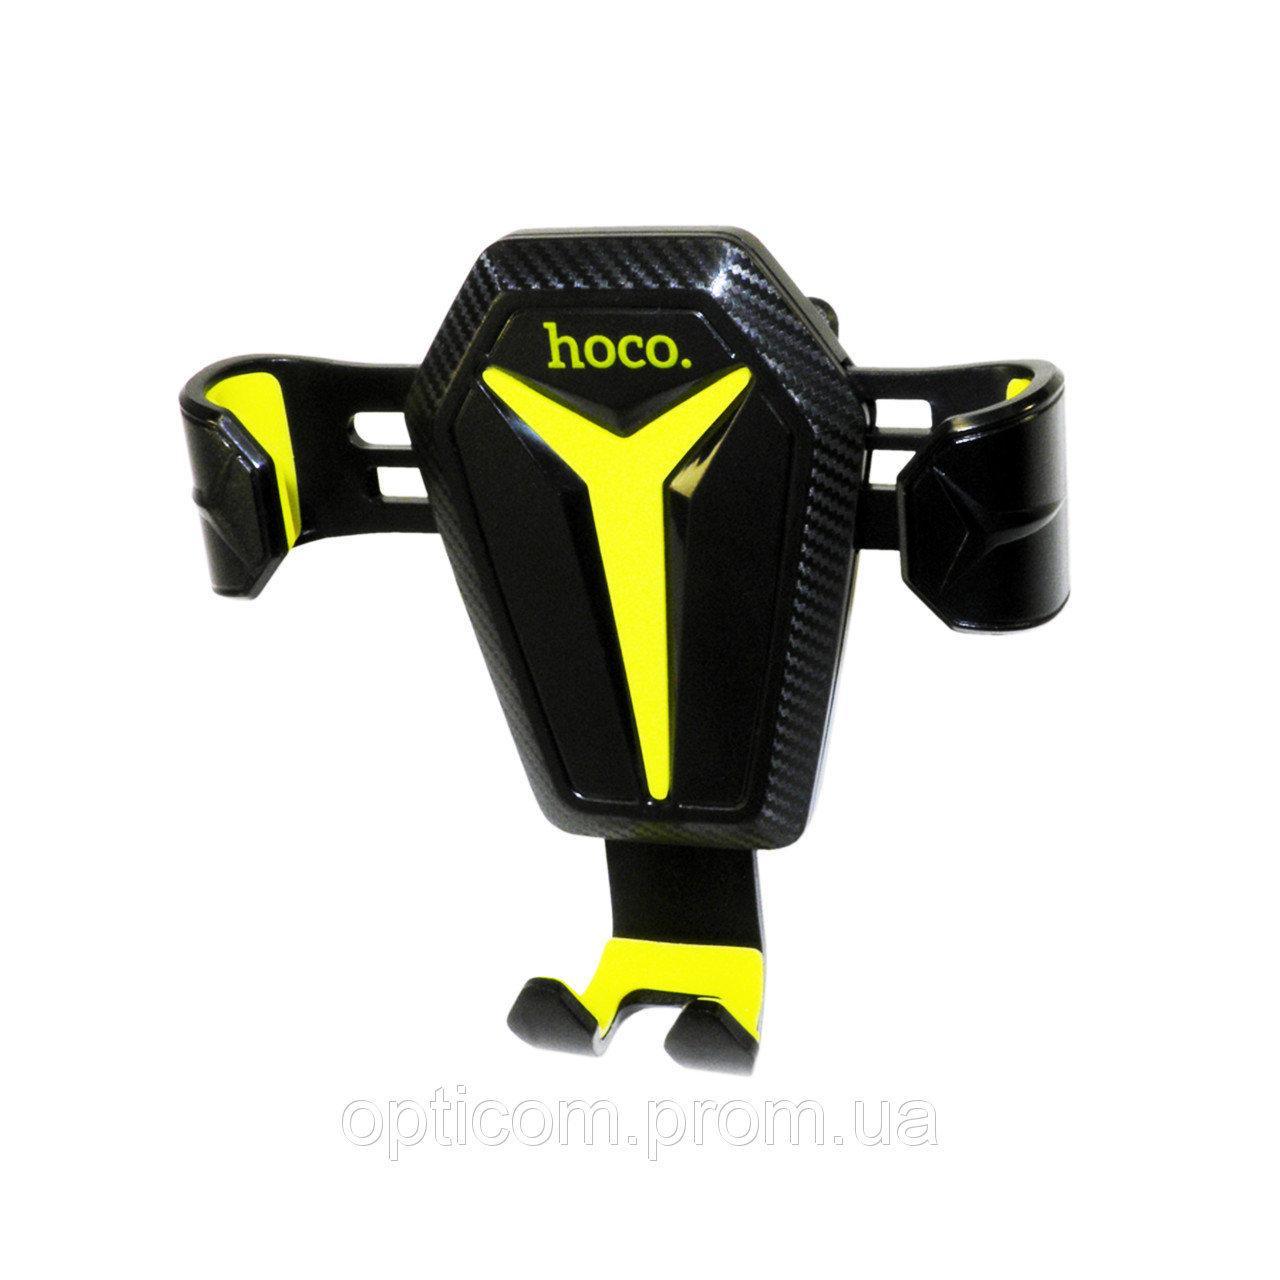 Автодержатель Hoco CA22 Black Yellow (CA22)